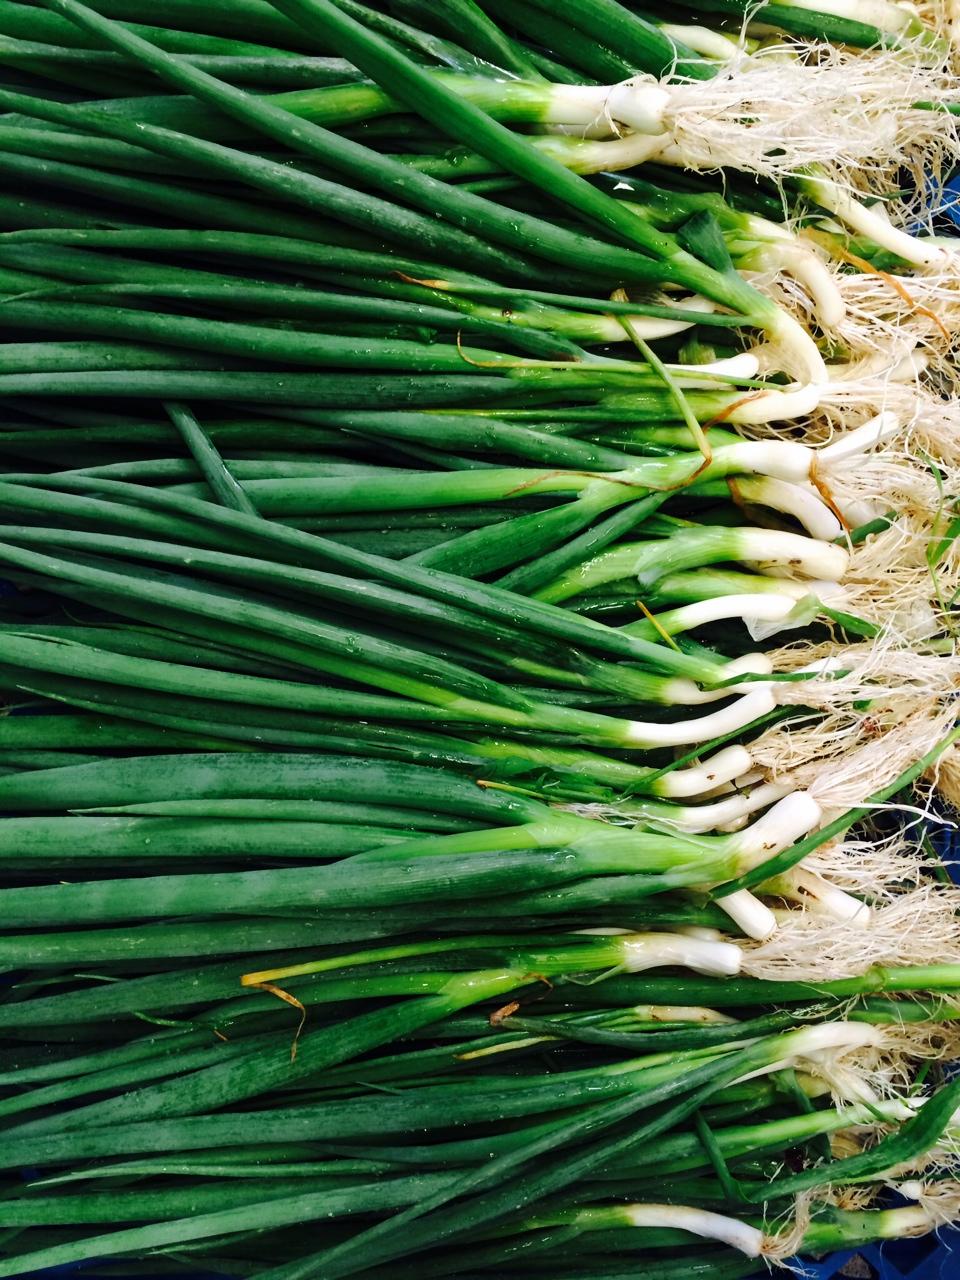 Vibrant Spring onions